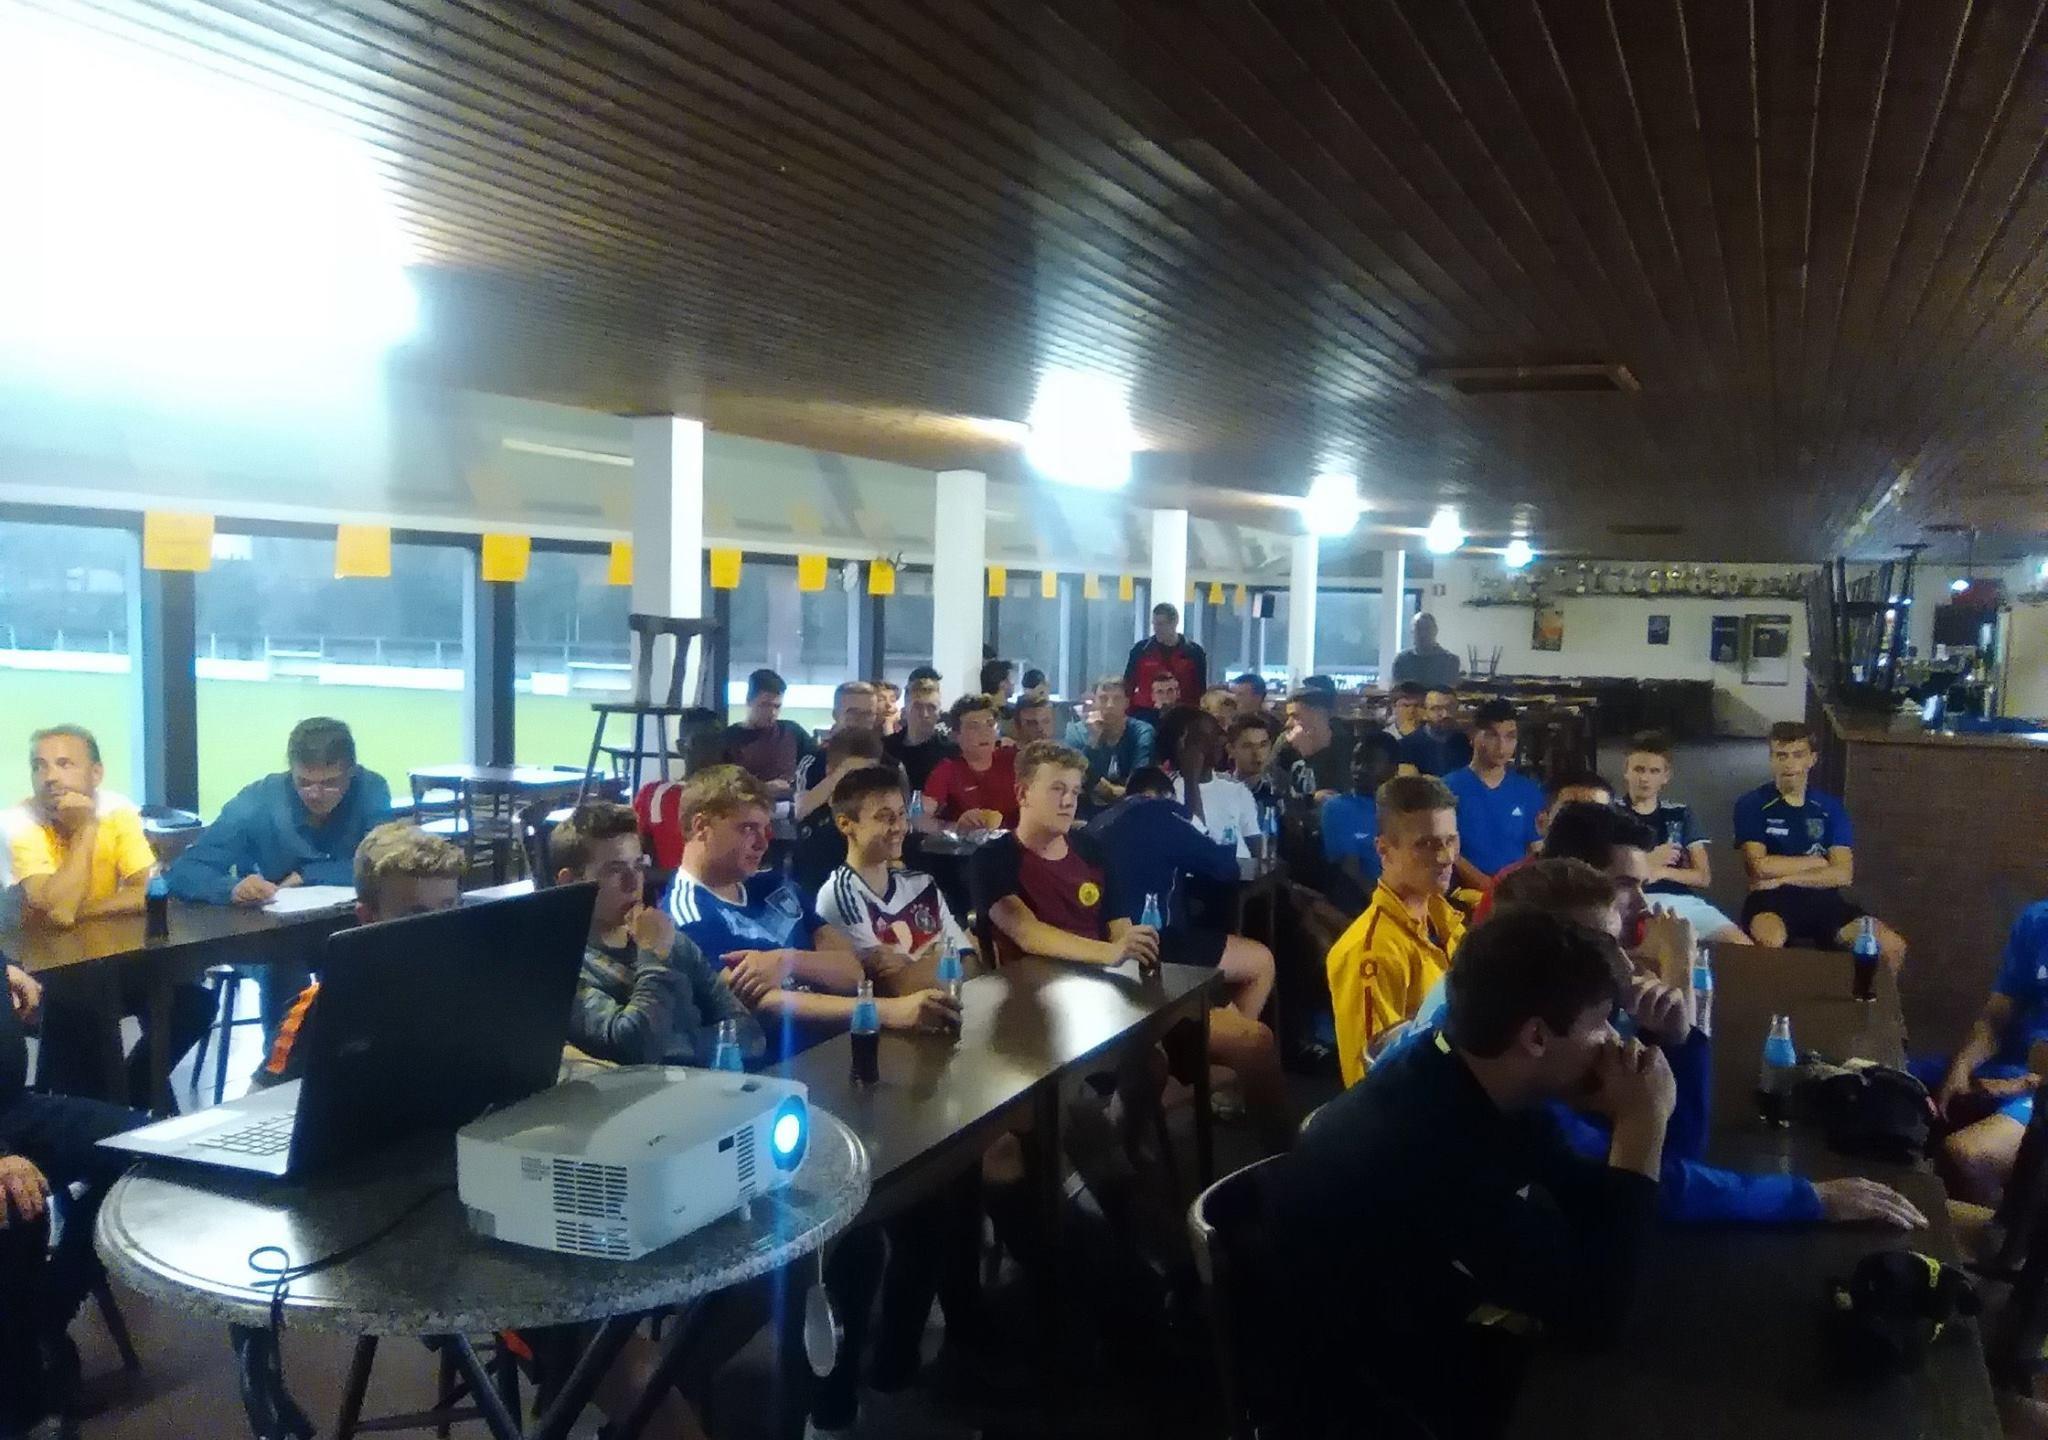 Clubbezoek aan VV Laakdal